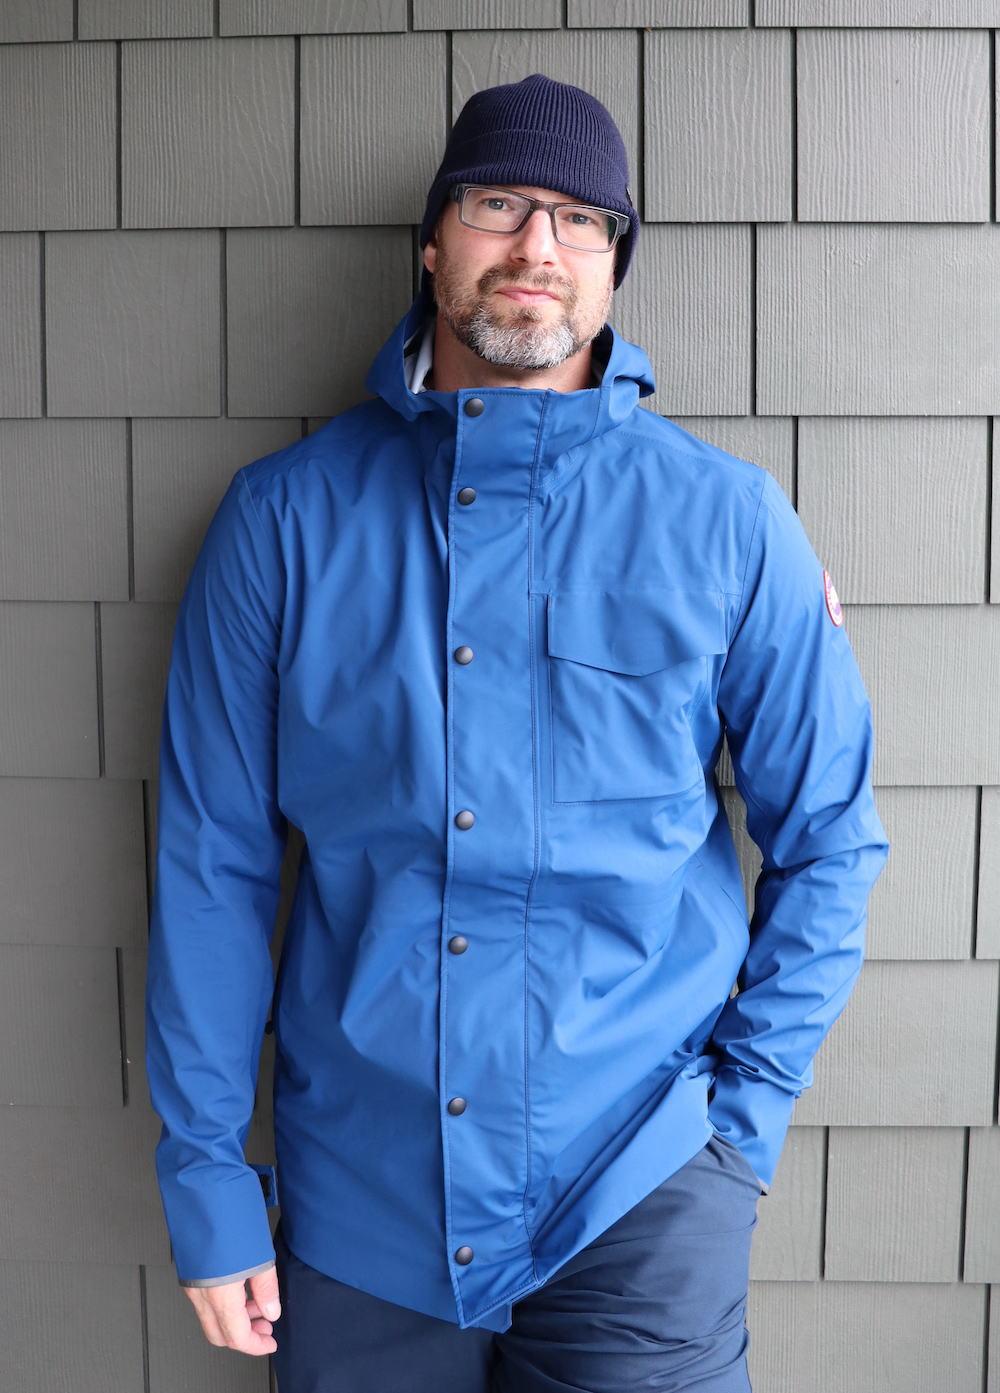 Wearing Canada Goose Rain Jacket